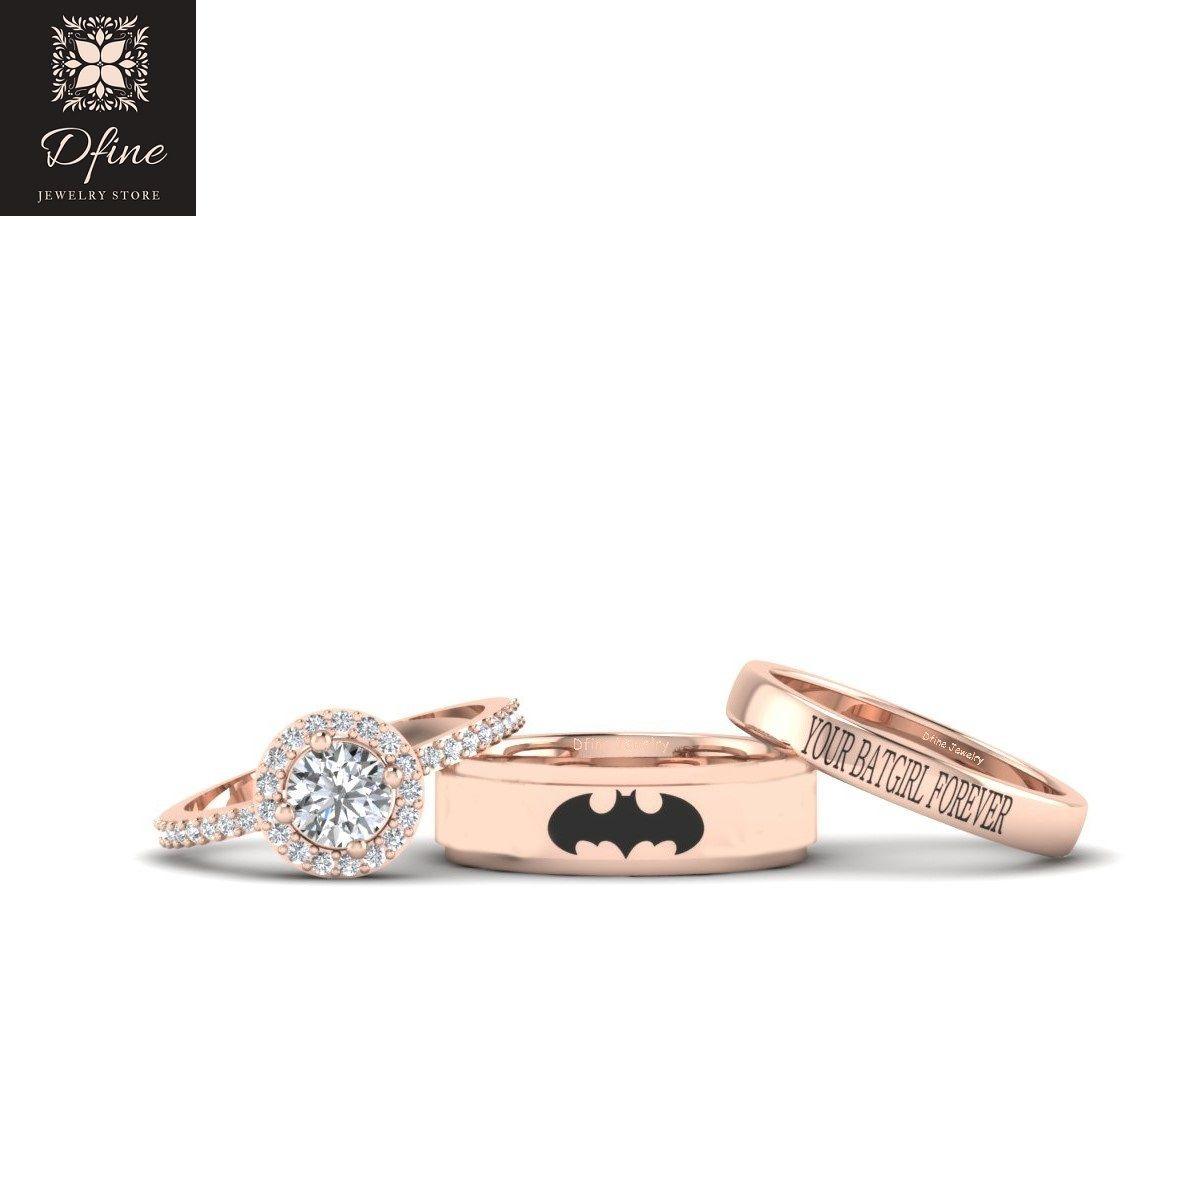 Halo Diamond Superhero Batman Wedding Ring Set Dfine Jewelry Store Blue Diamond Engagement Ring Halo Wedding Rings Sets Batman Wedding Rings